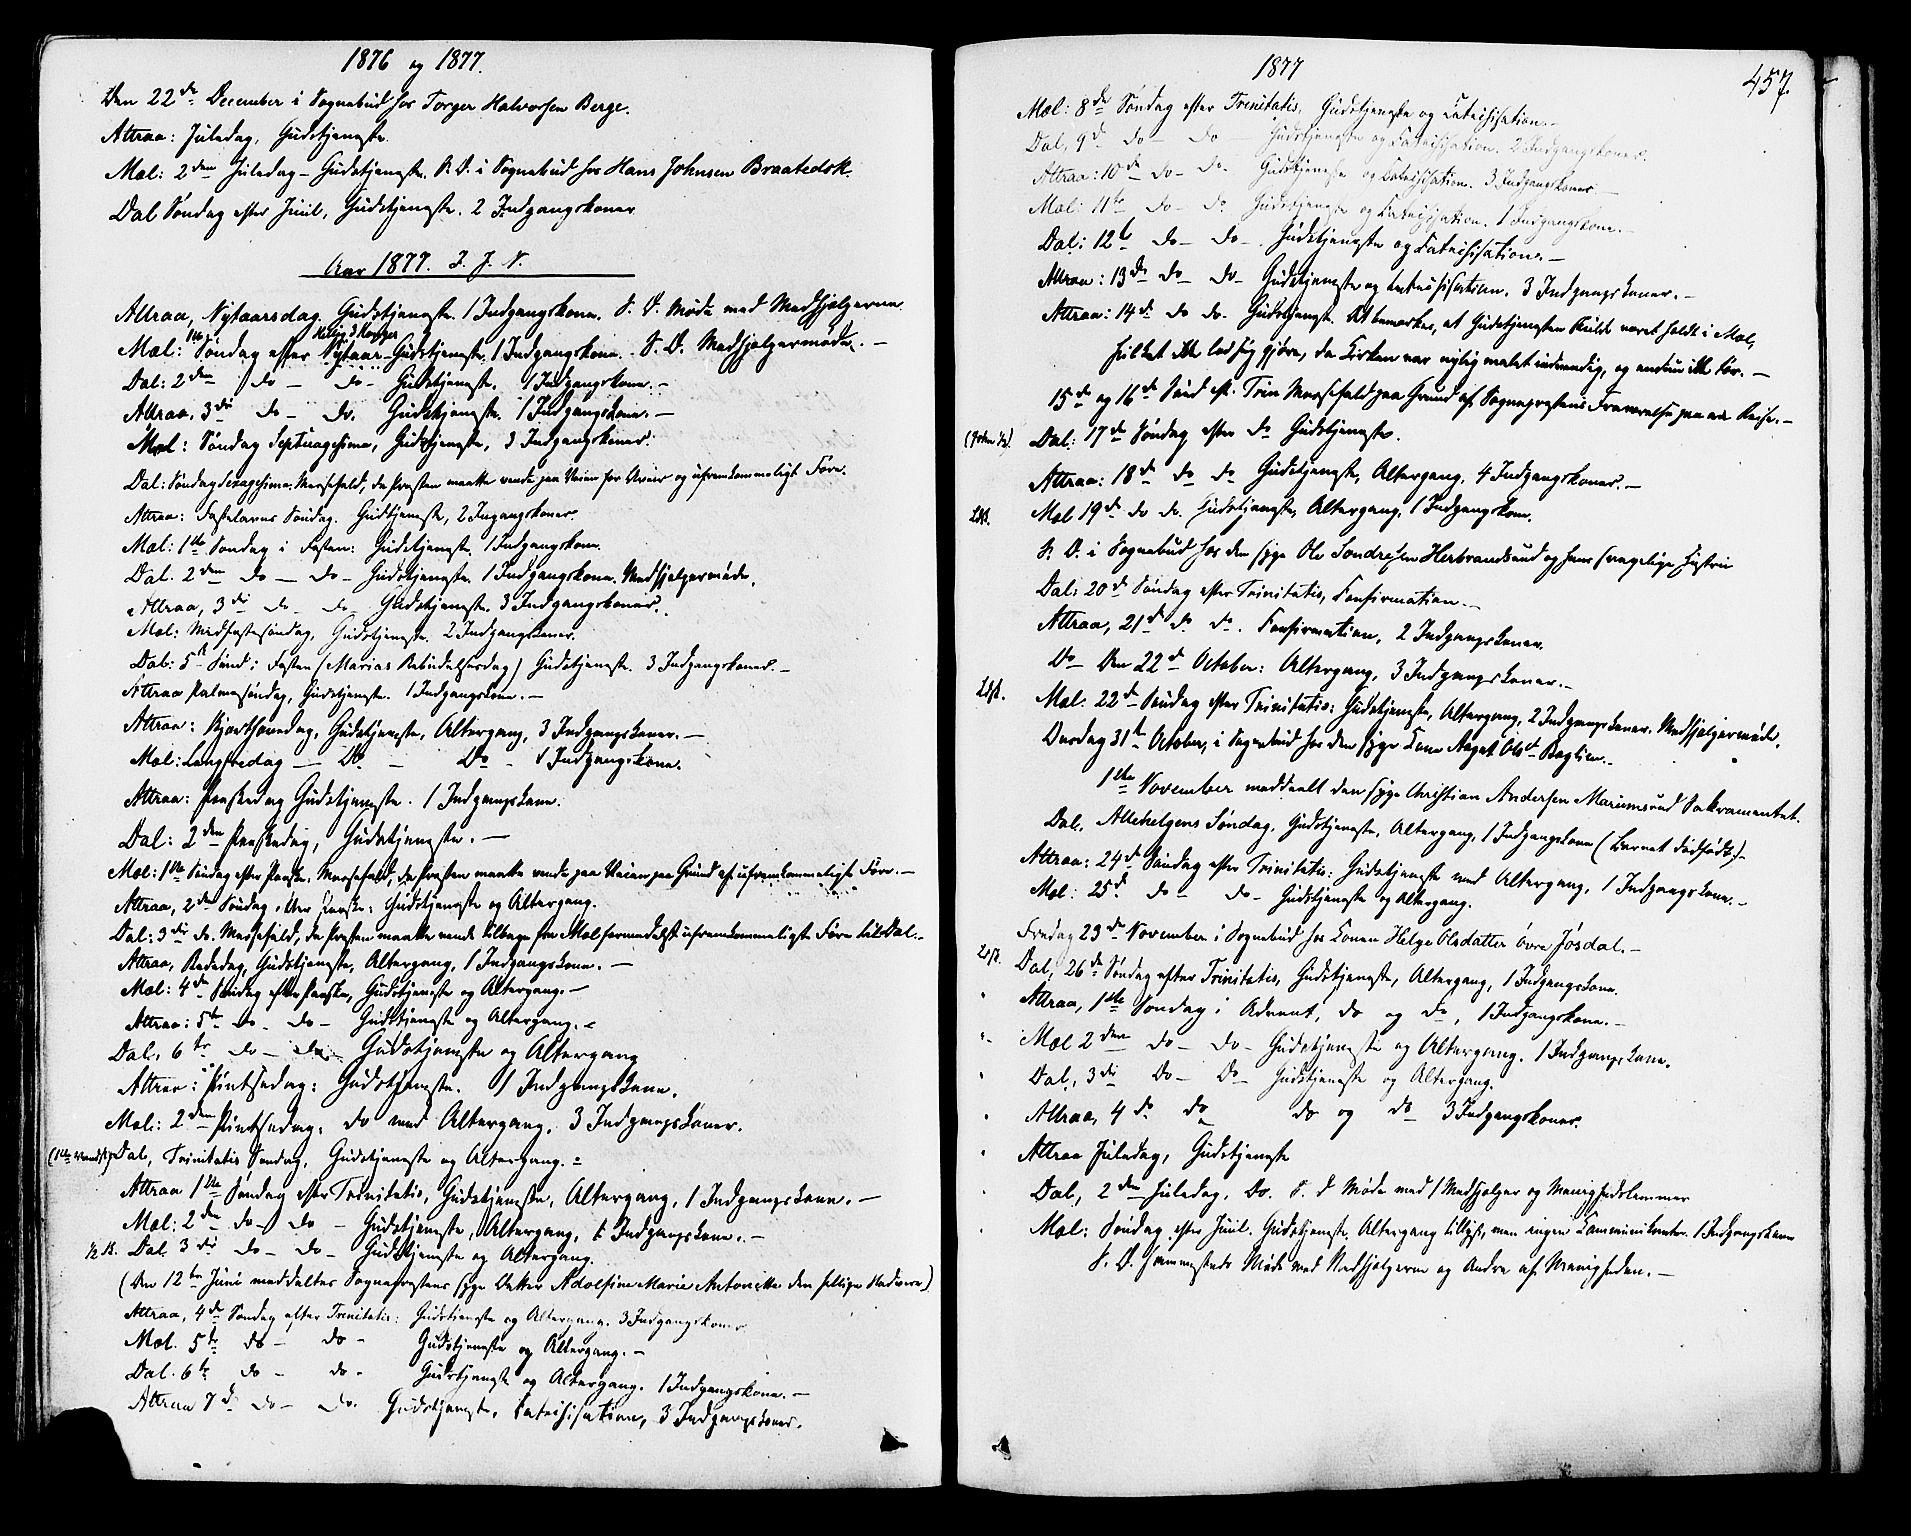 SAKO, Tinn kirkebøker, F/Fa/L0006: Ministerialbok nr. I 6, 1857-1878, s. 457